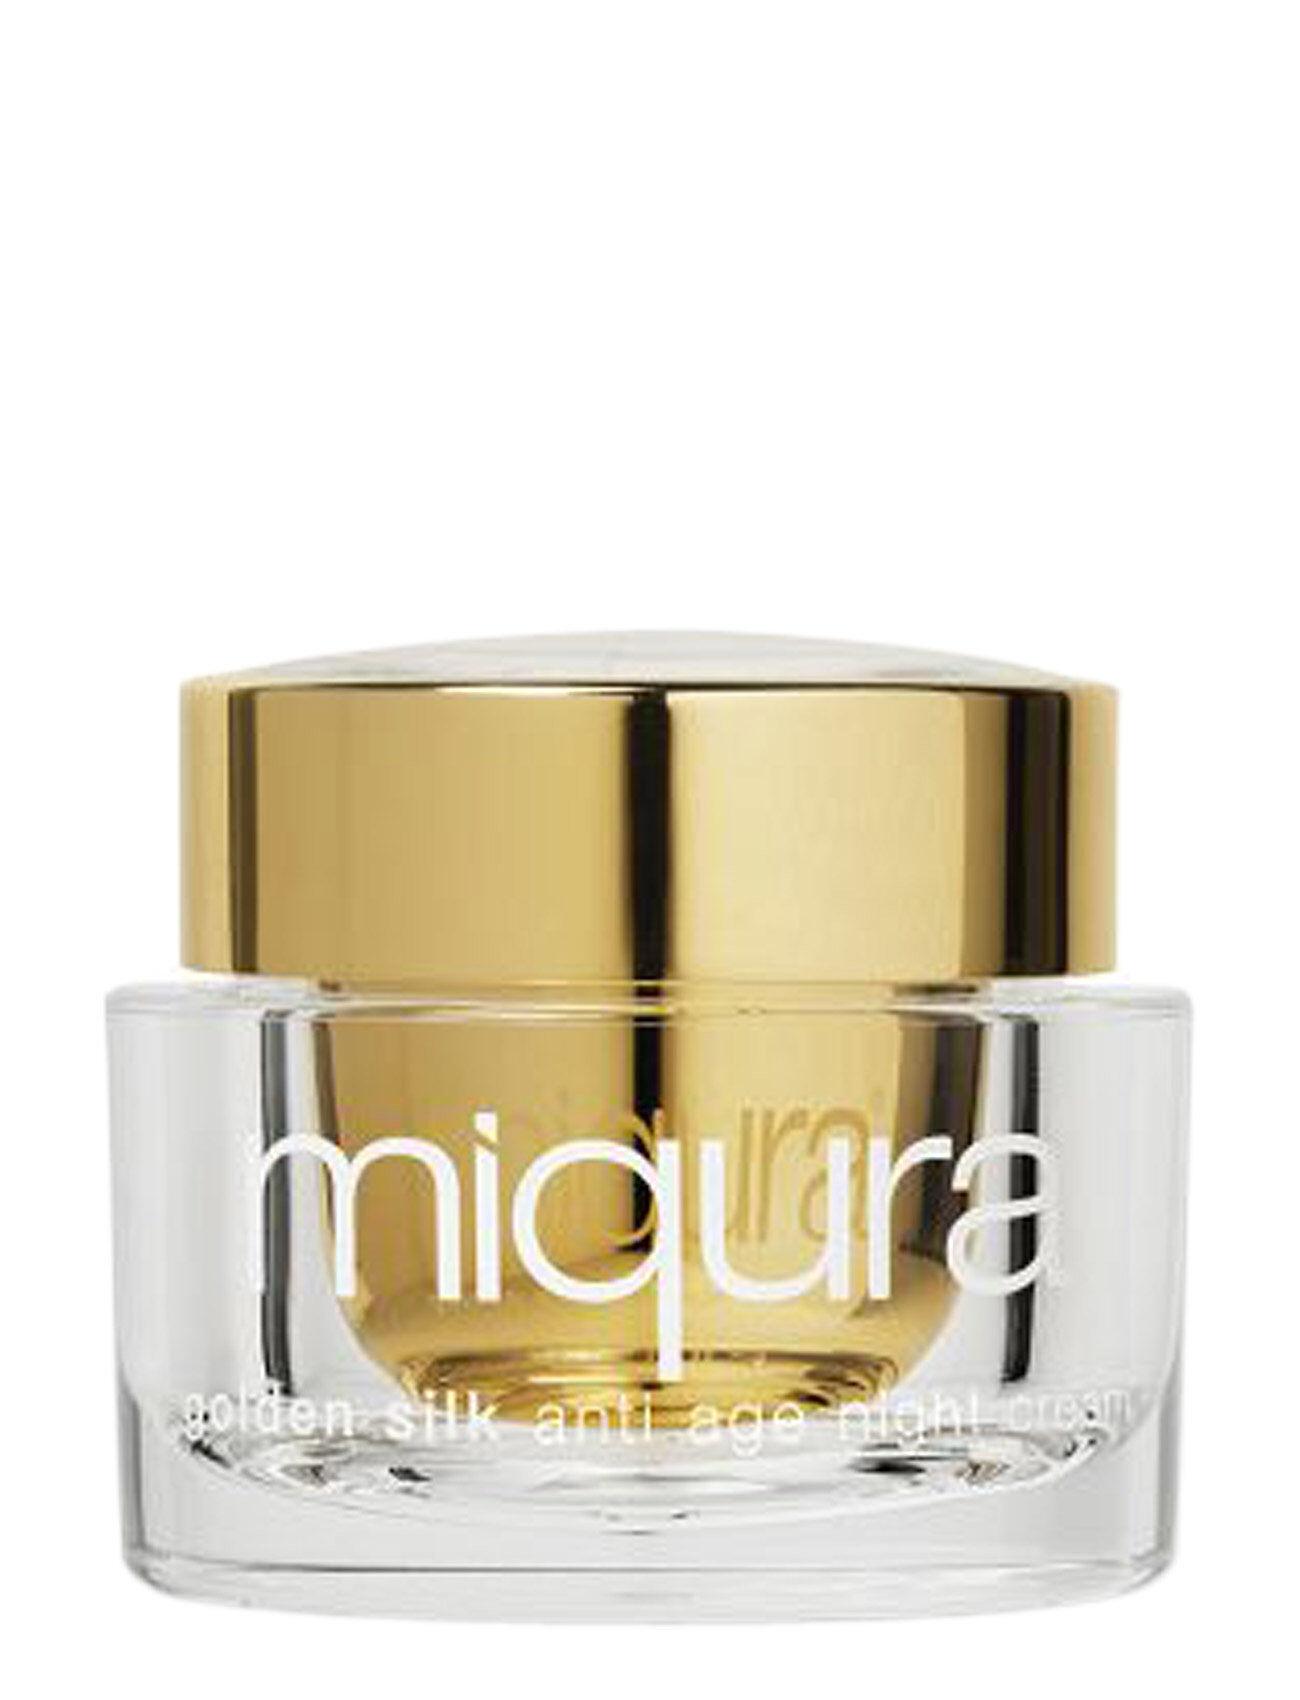 Miqura Golden Silk Anti Age Night Cream